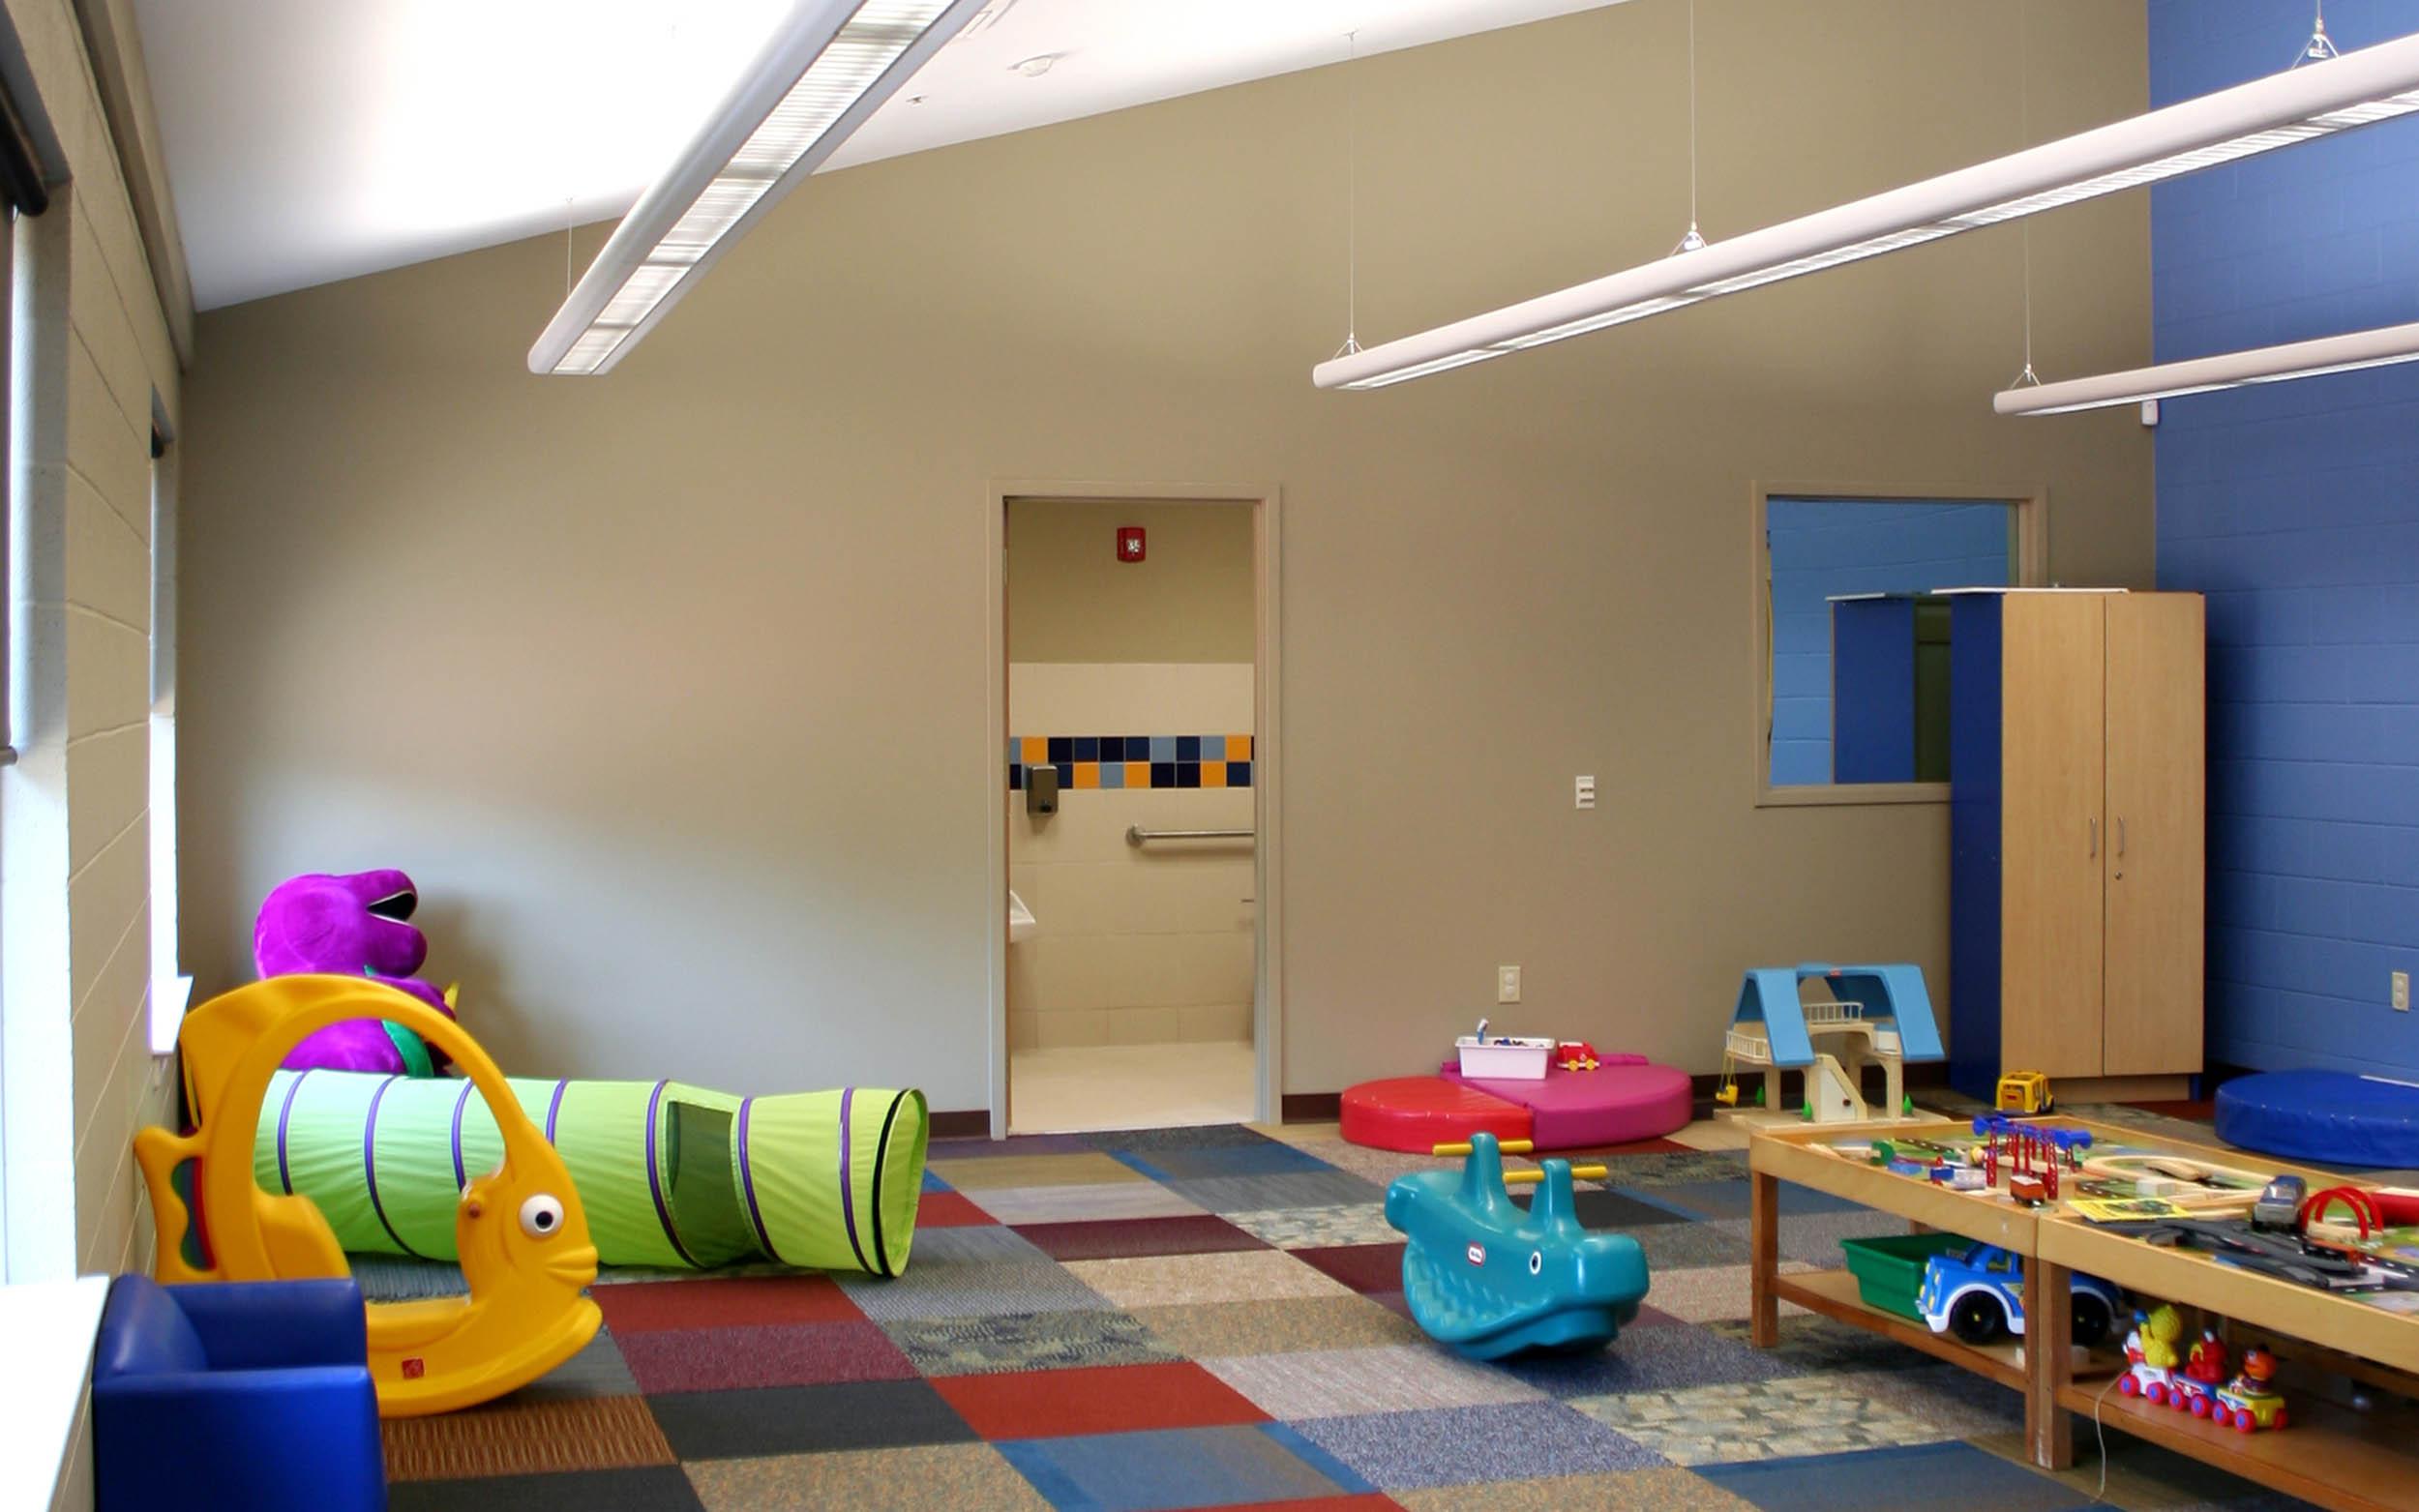 Barium Springs Home for Children